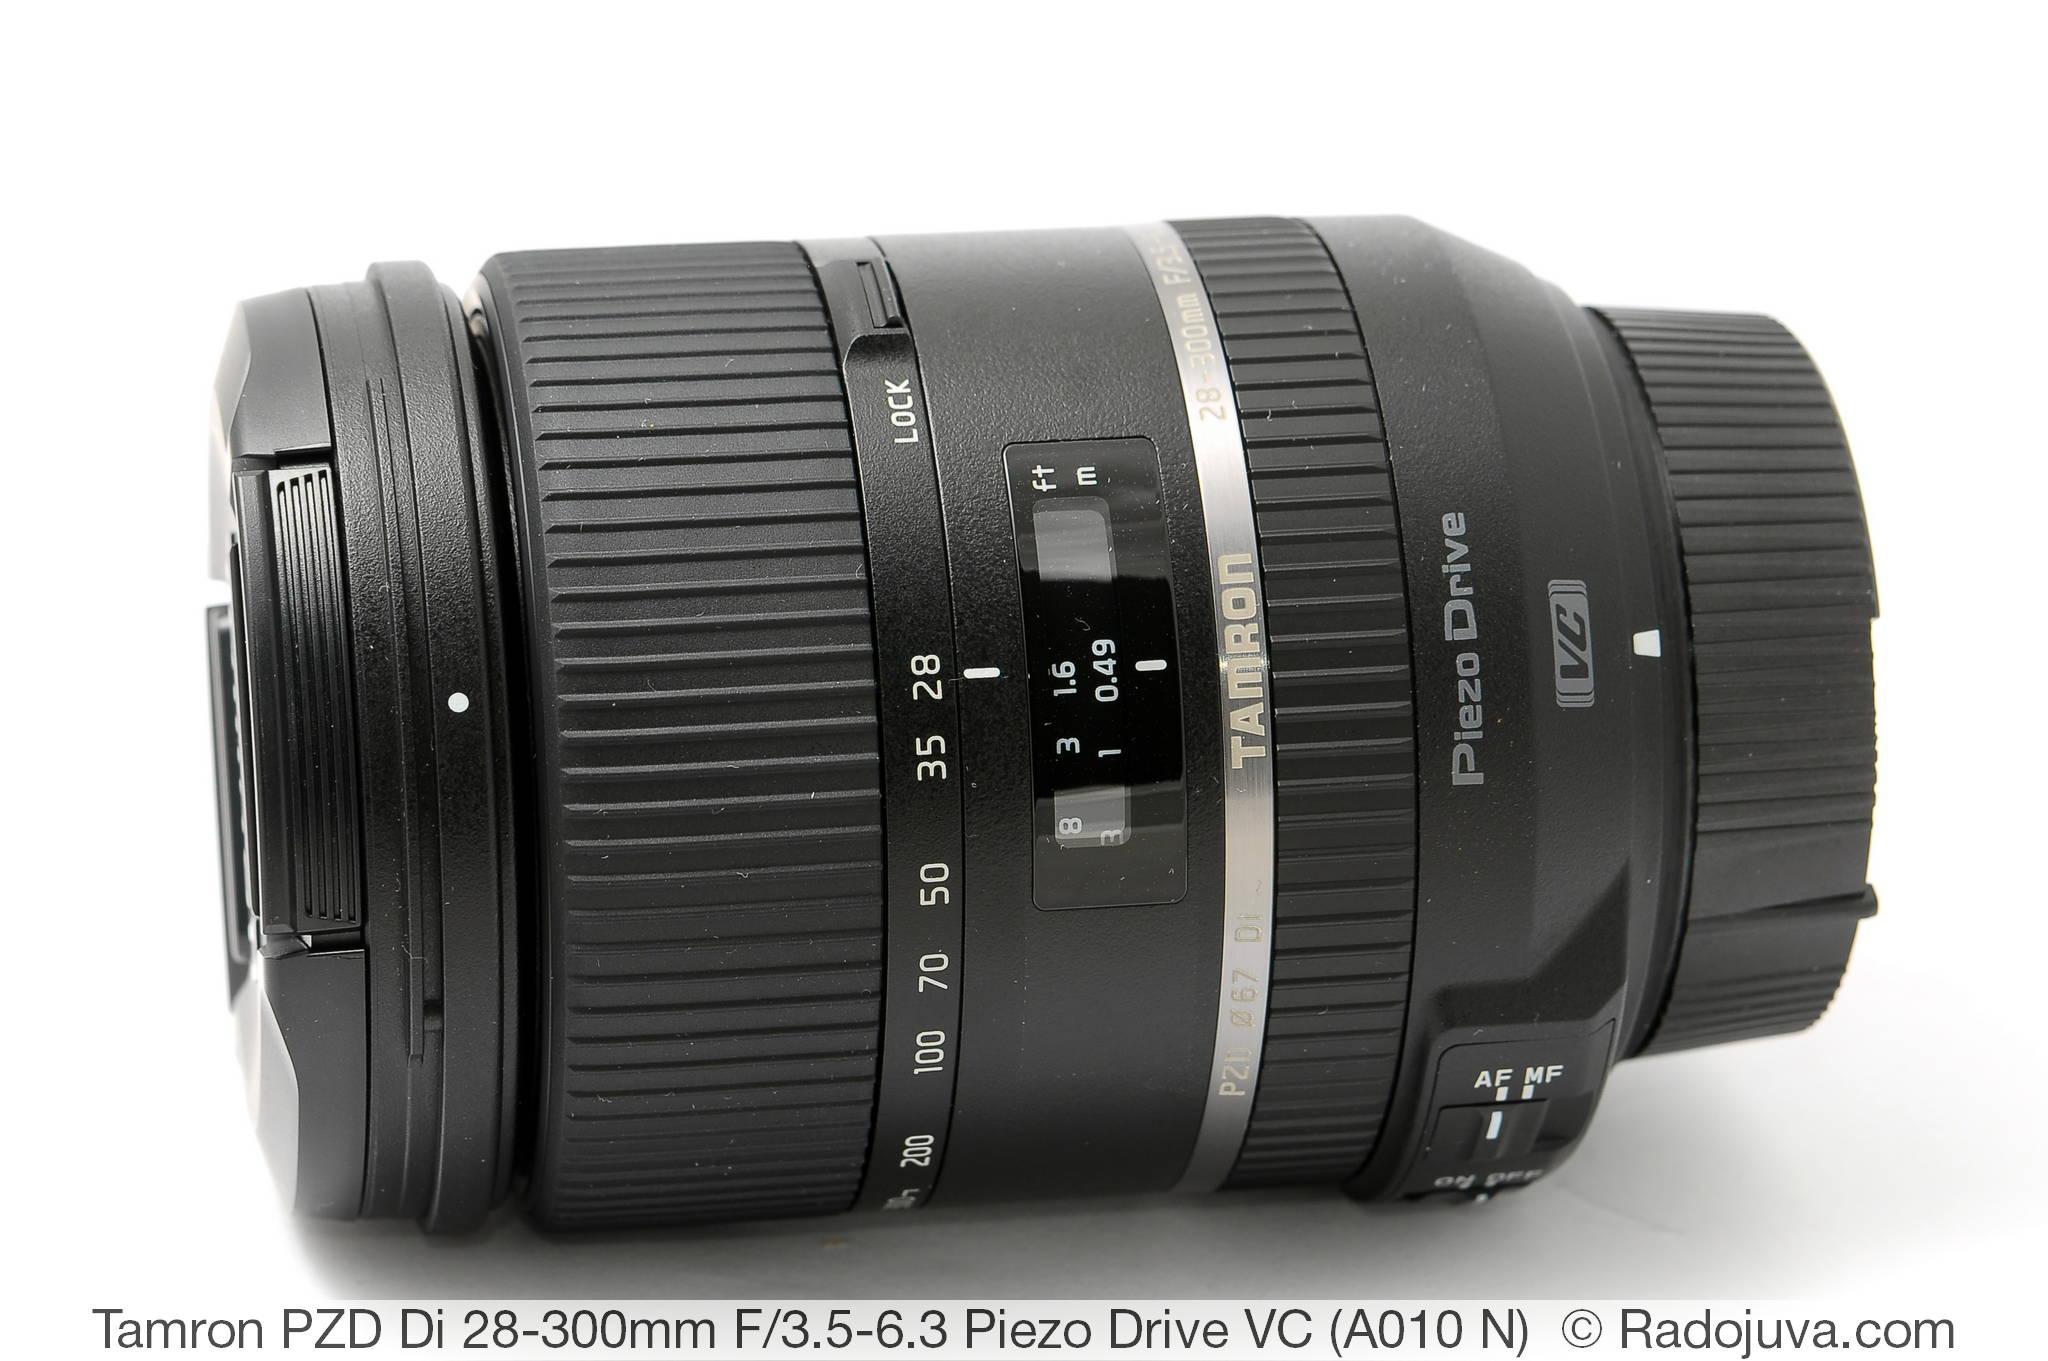 Tamron PZD Di 28-300mm F/3.5-6.3 Piezo Drive VC Model A010